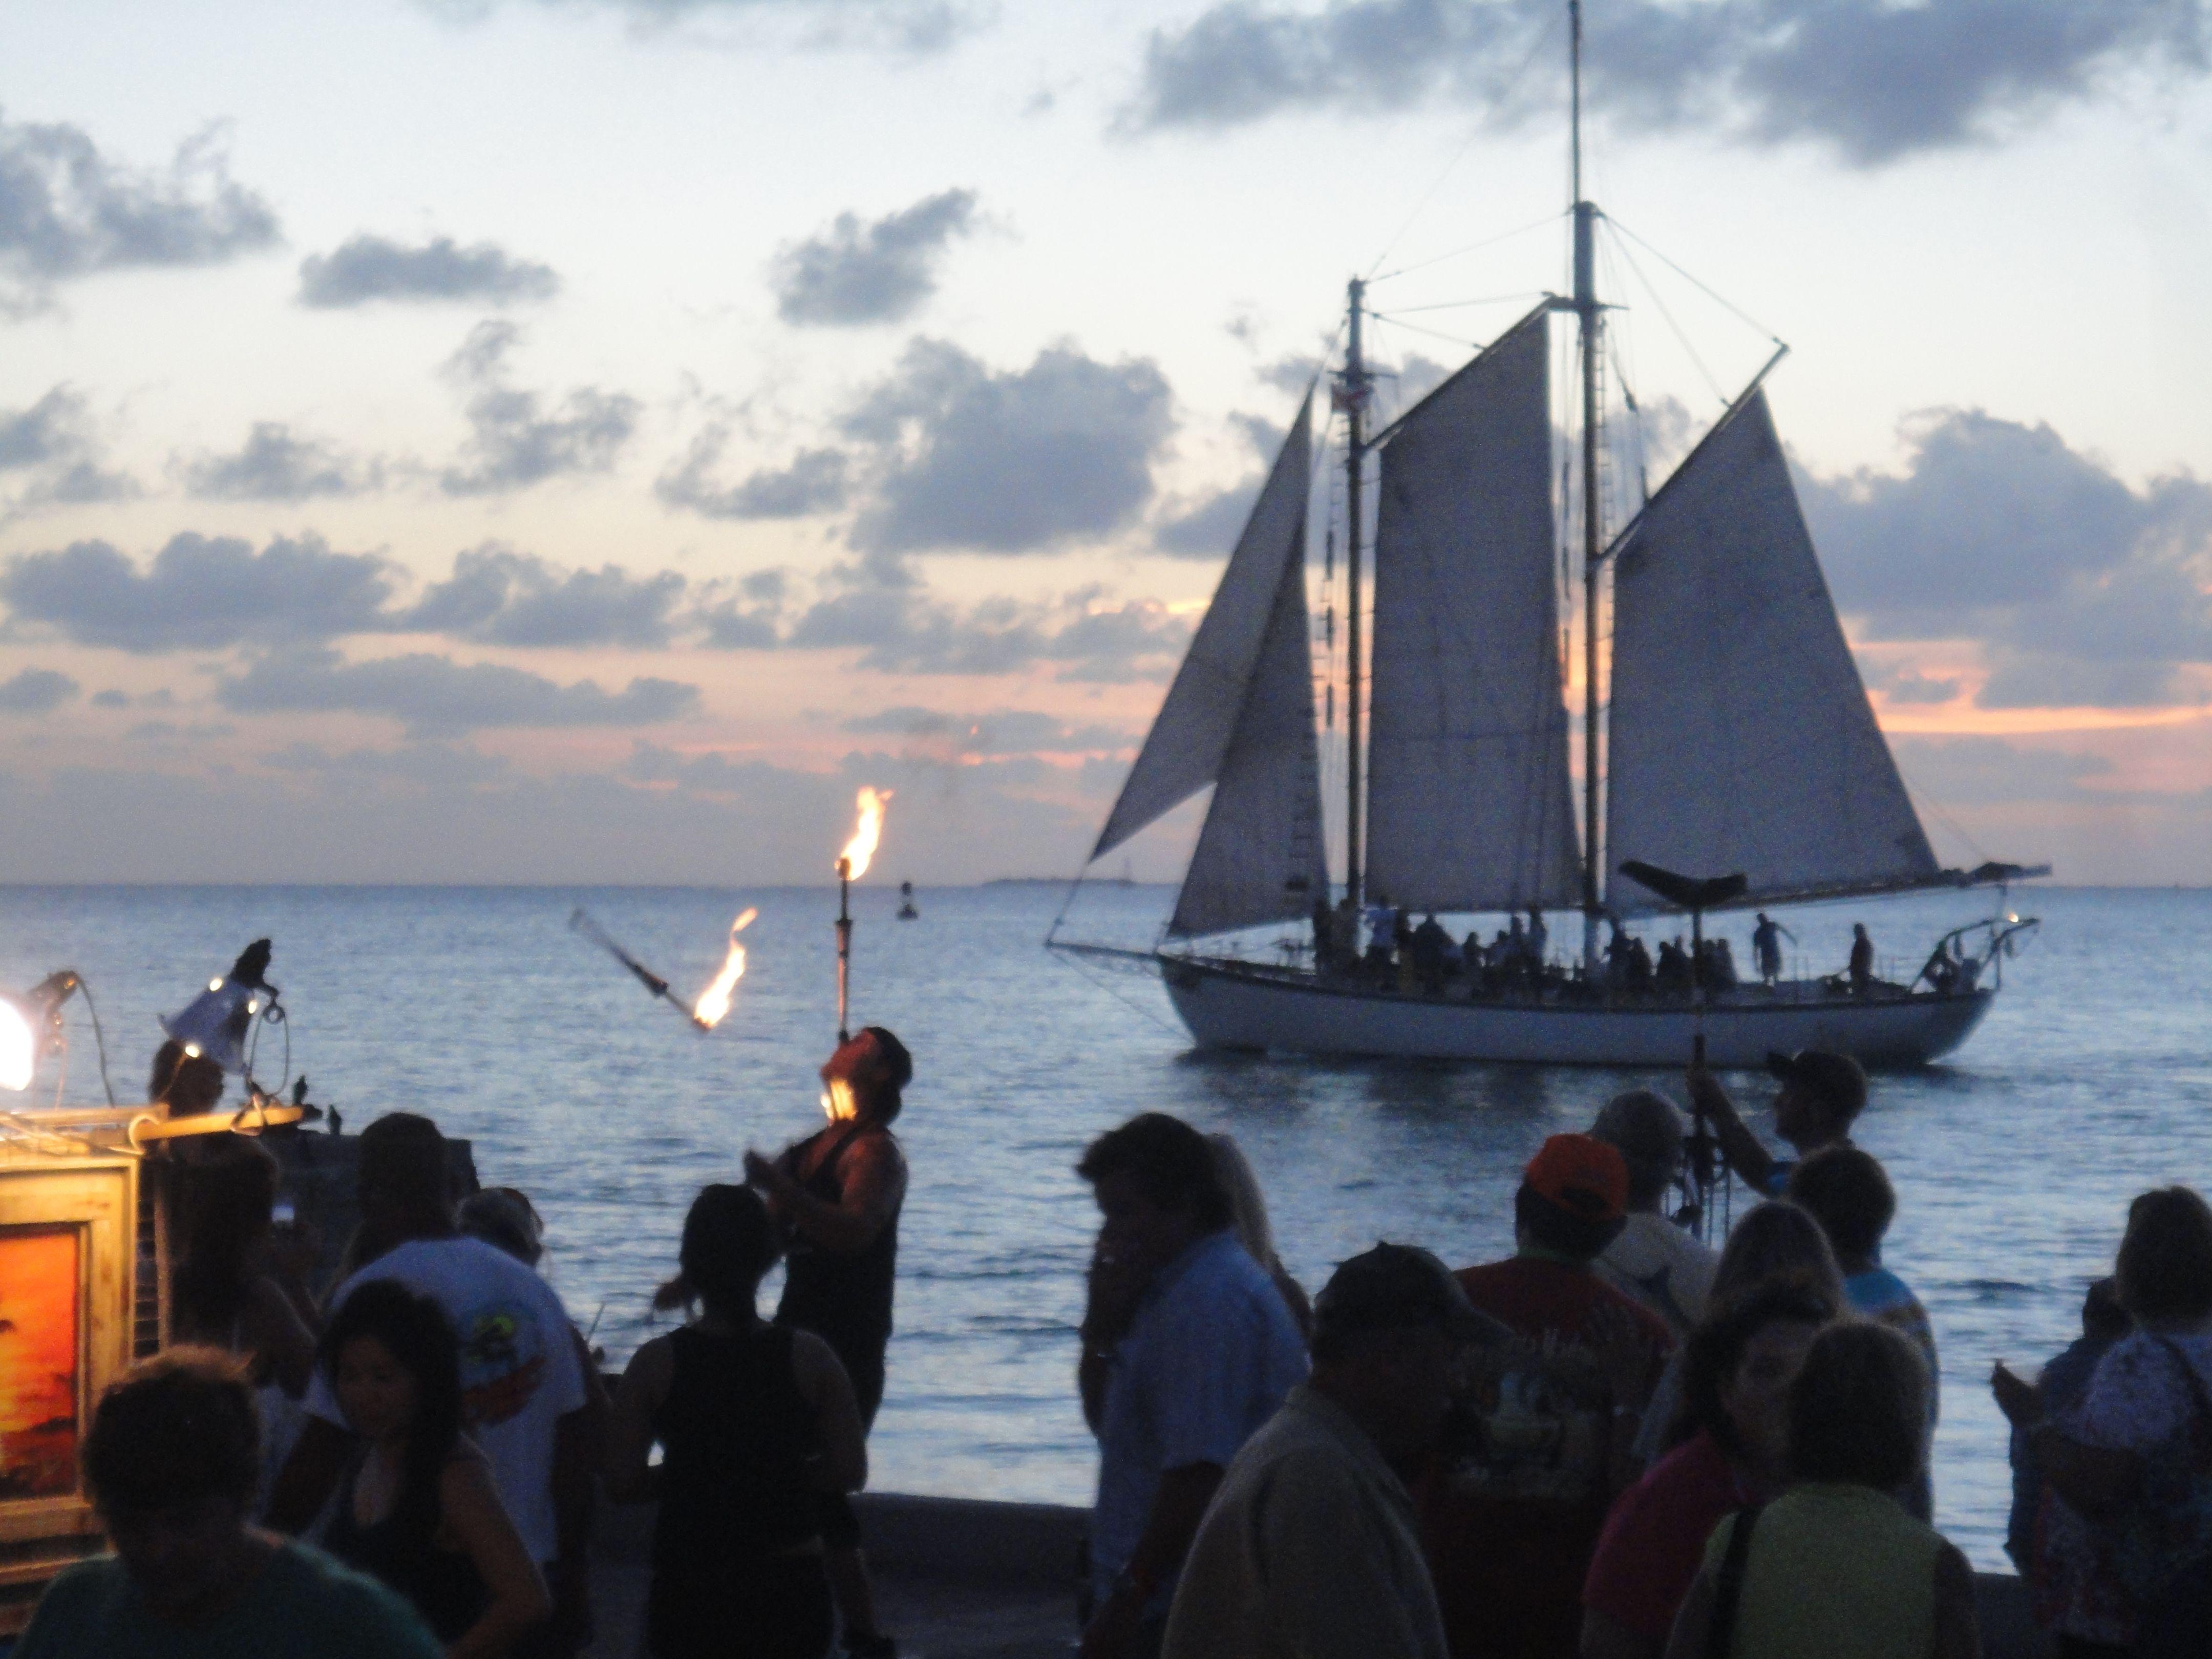 Sunset celebration at Mallory Square, Key West.